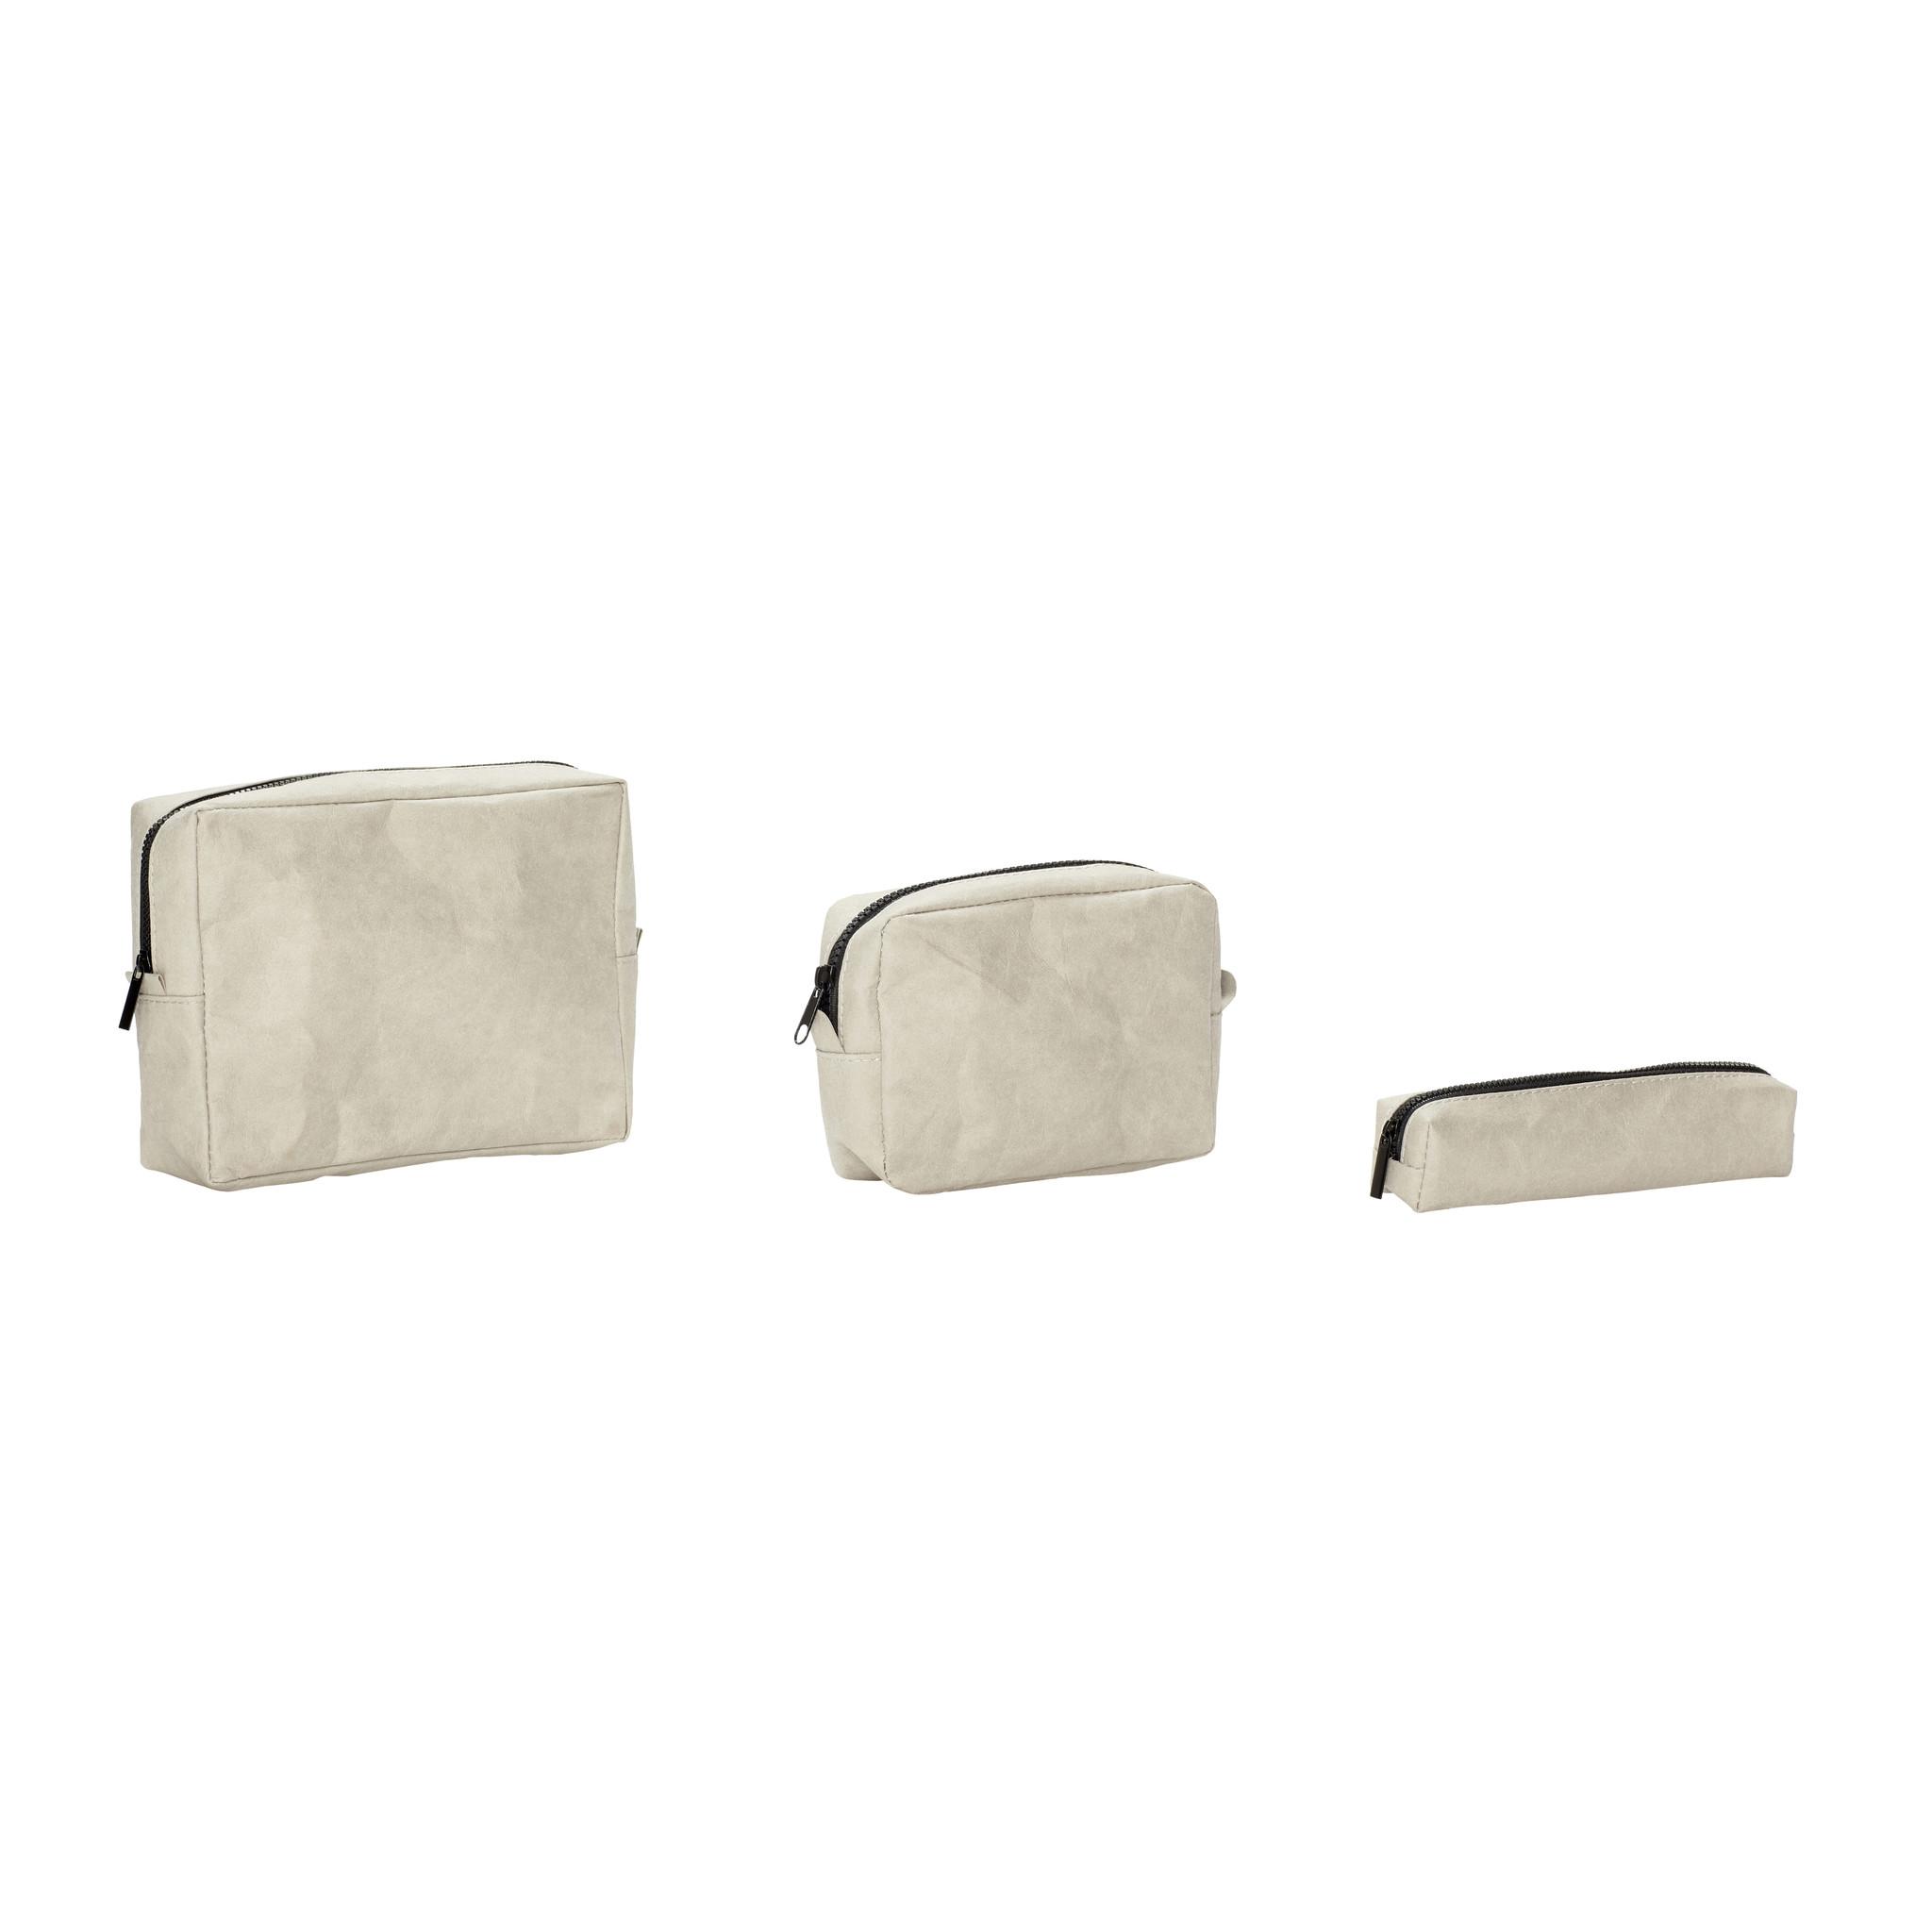 Hubsch Zakje, vierkant, wasbaar papier, zand, set van 3